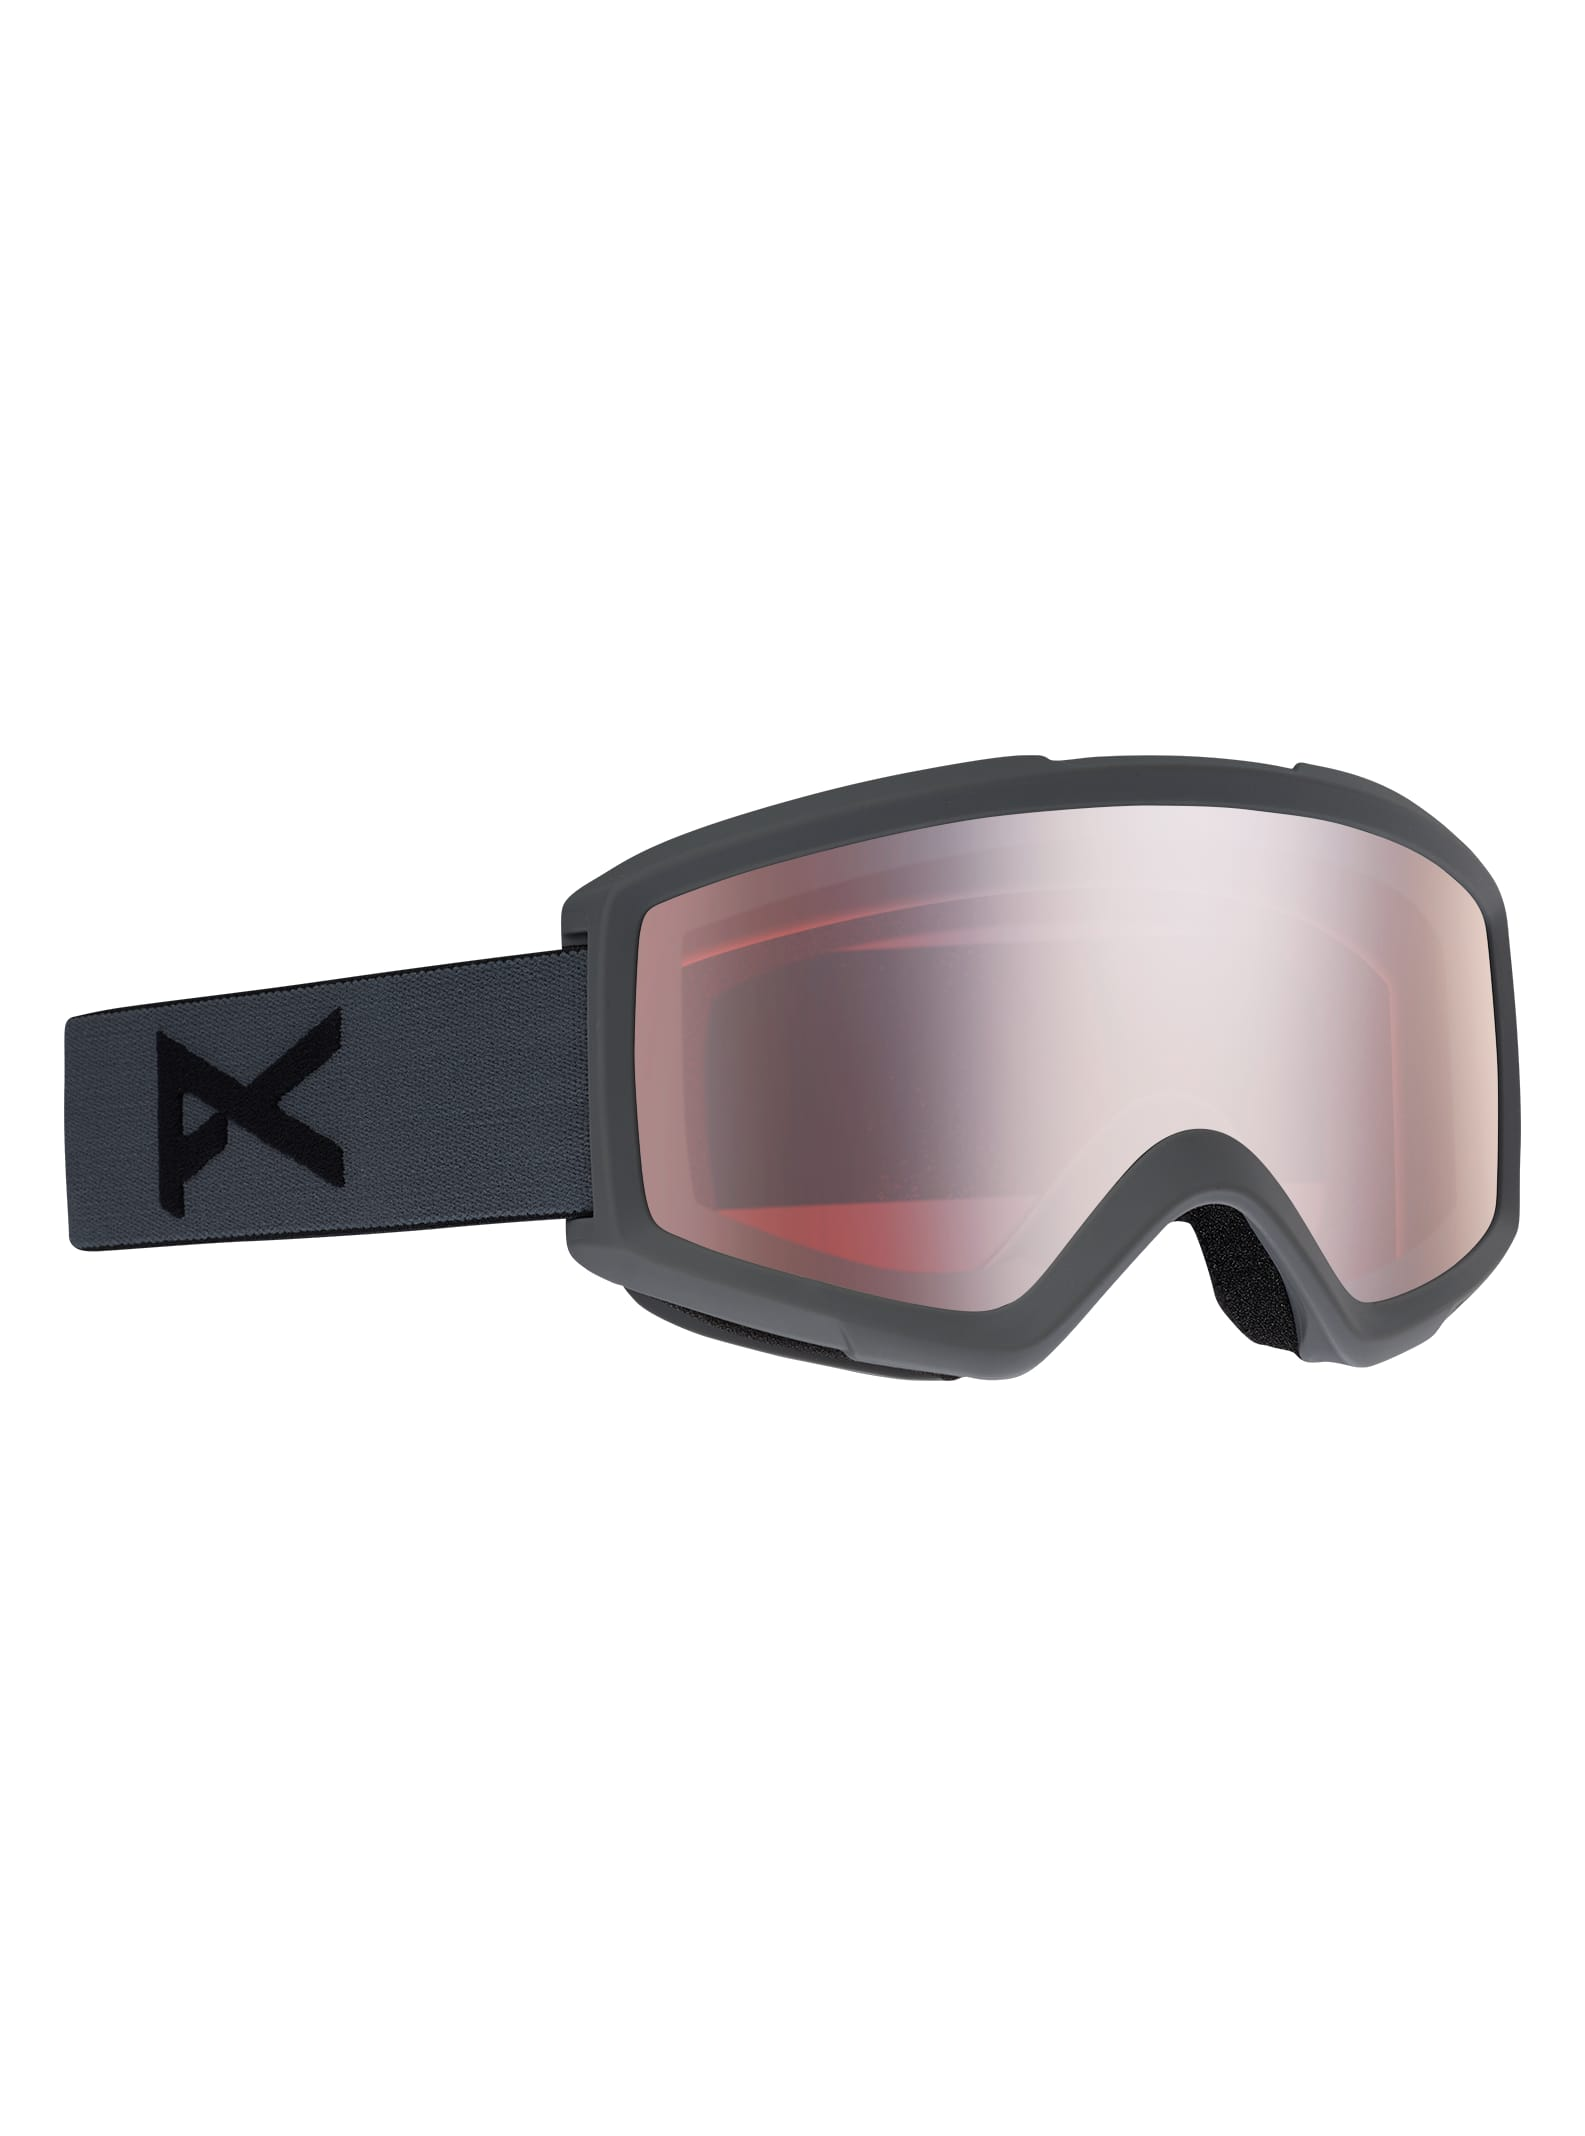 Anon Helix för herrar 2,0 skidglasögon + reservlins, Frame: Stealth, Lens: Silver Amber, Spare Lens: Amber